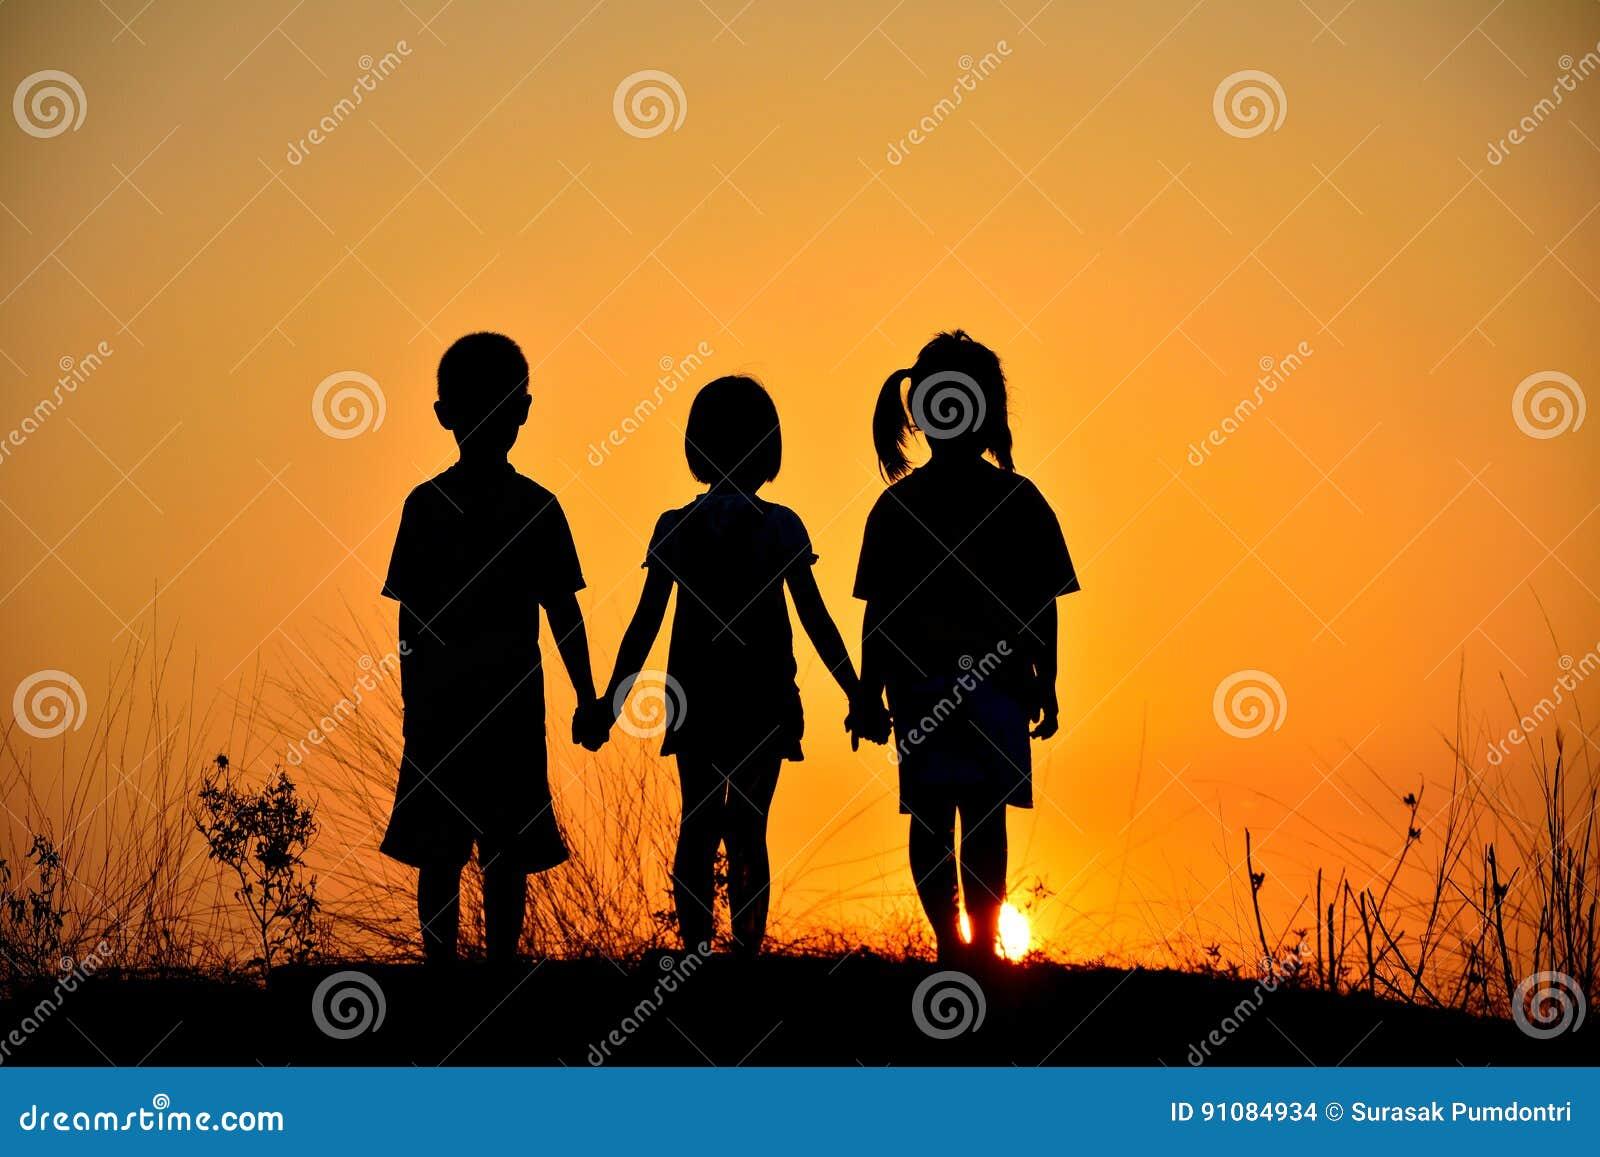 Silhouette friendship of three